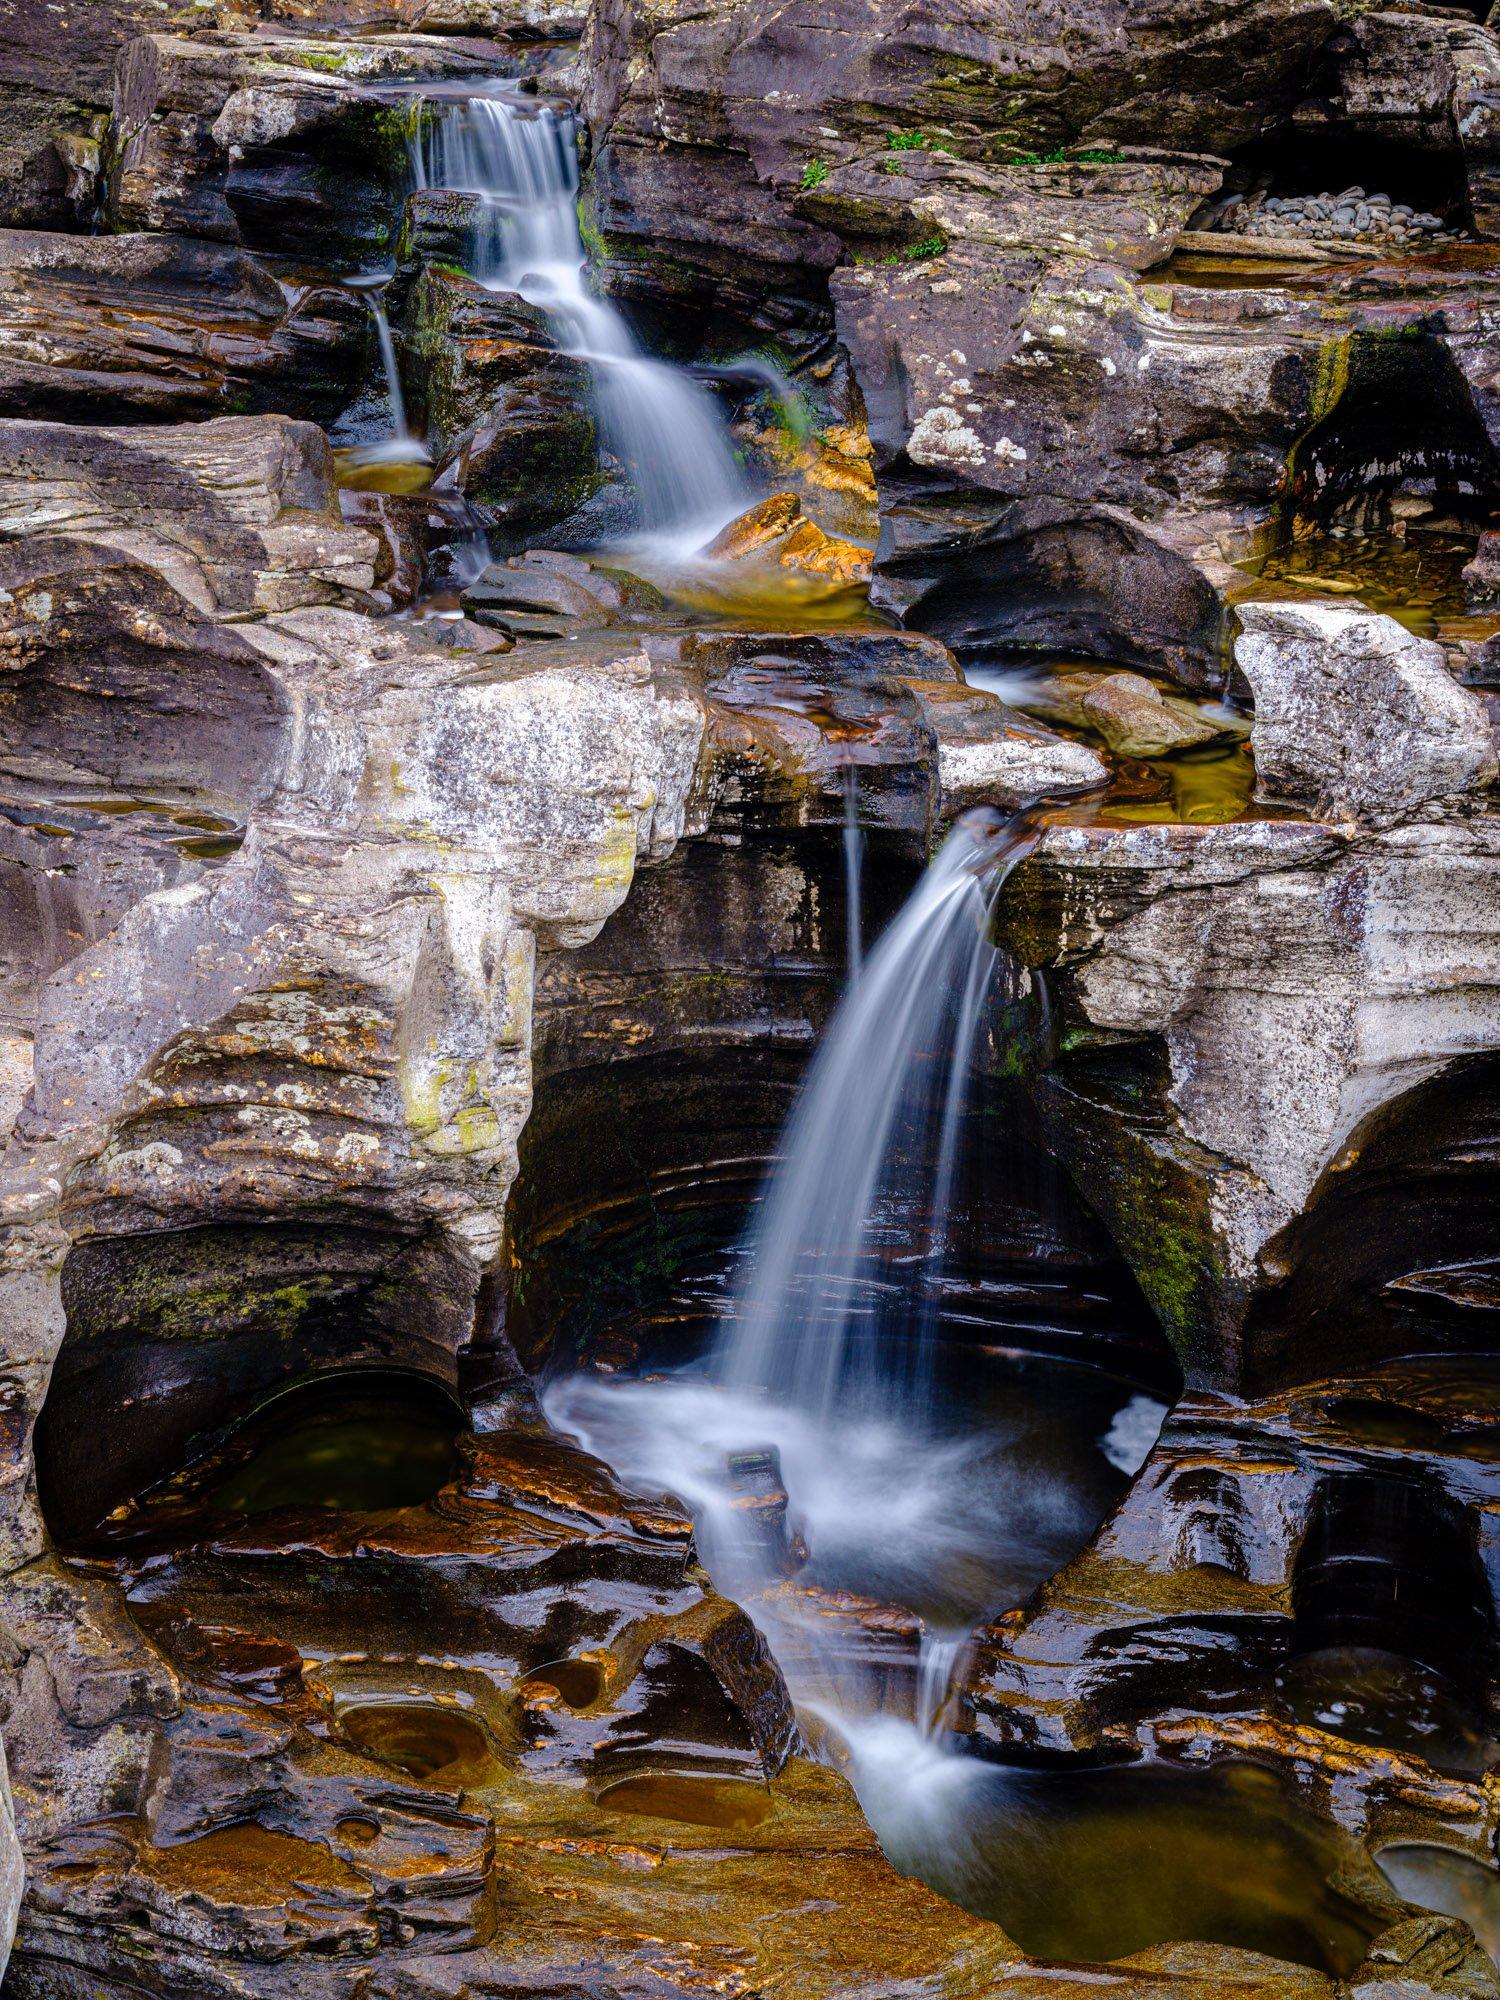 Scotland With the Fujifilm GFX 50S - Ugo Cei Photography